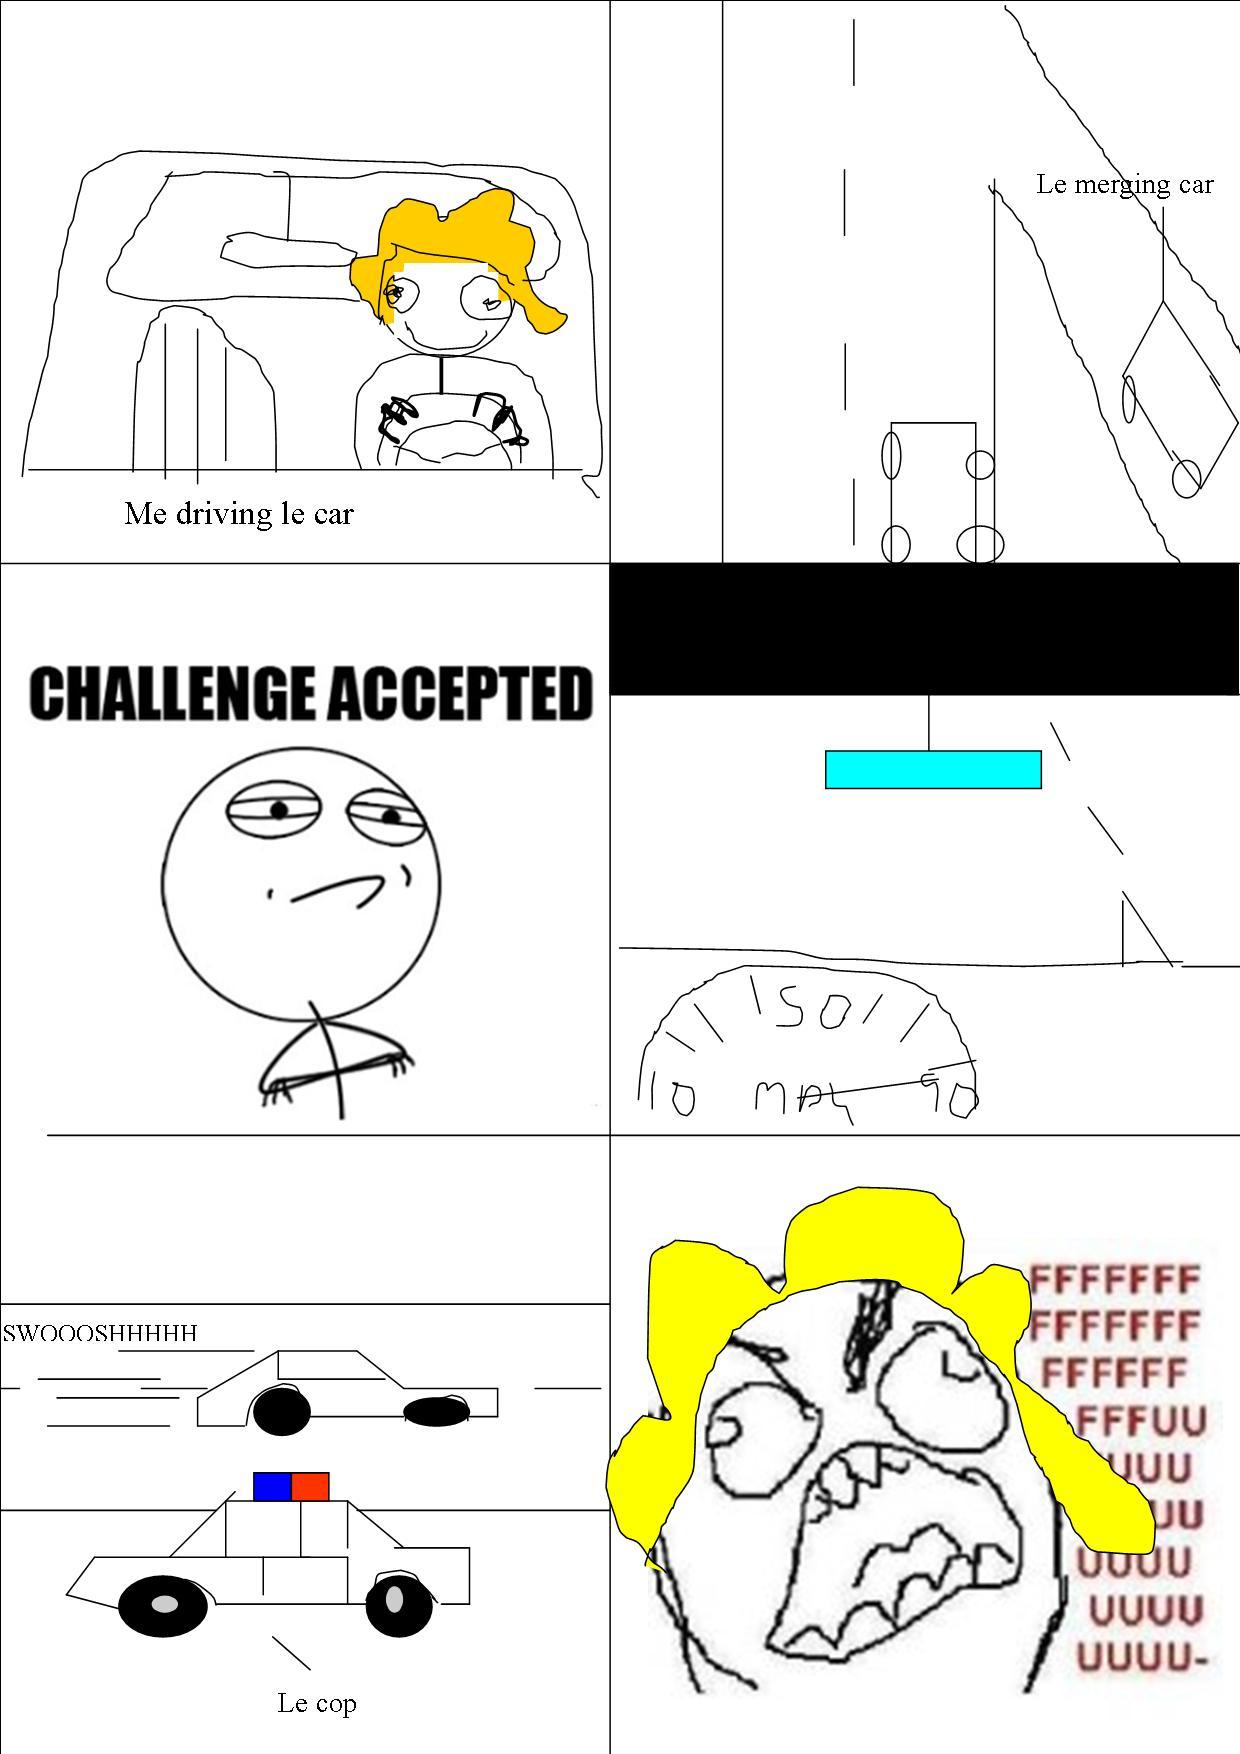 meme faces challenge accepted - photo #24